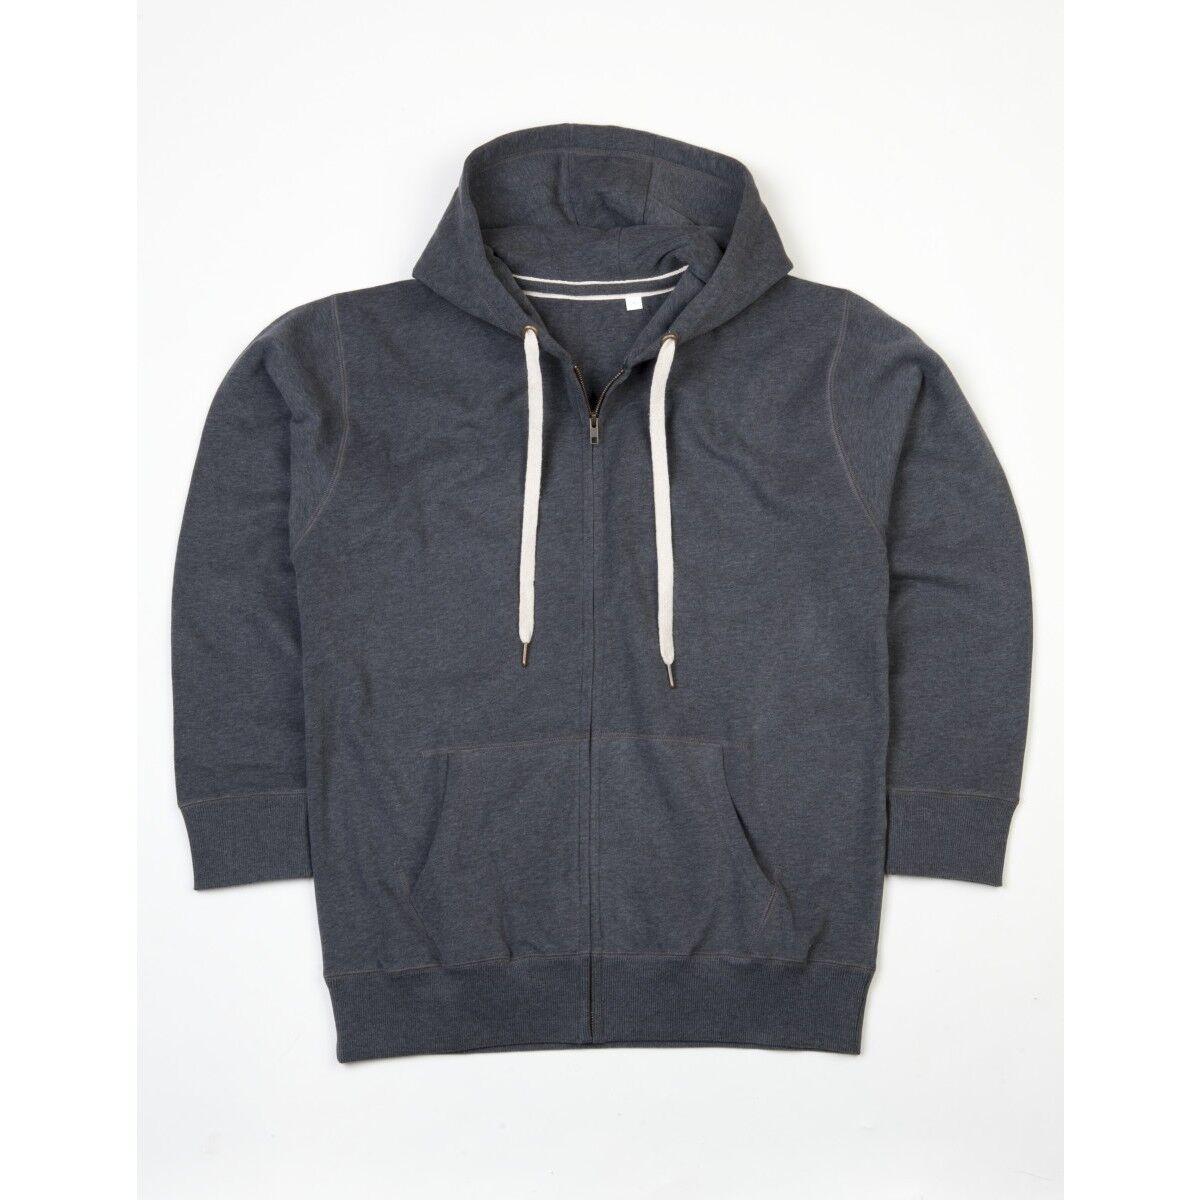 Zipped Mantis Hoodie - Charcoal Grey